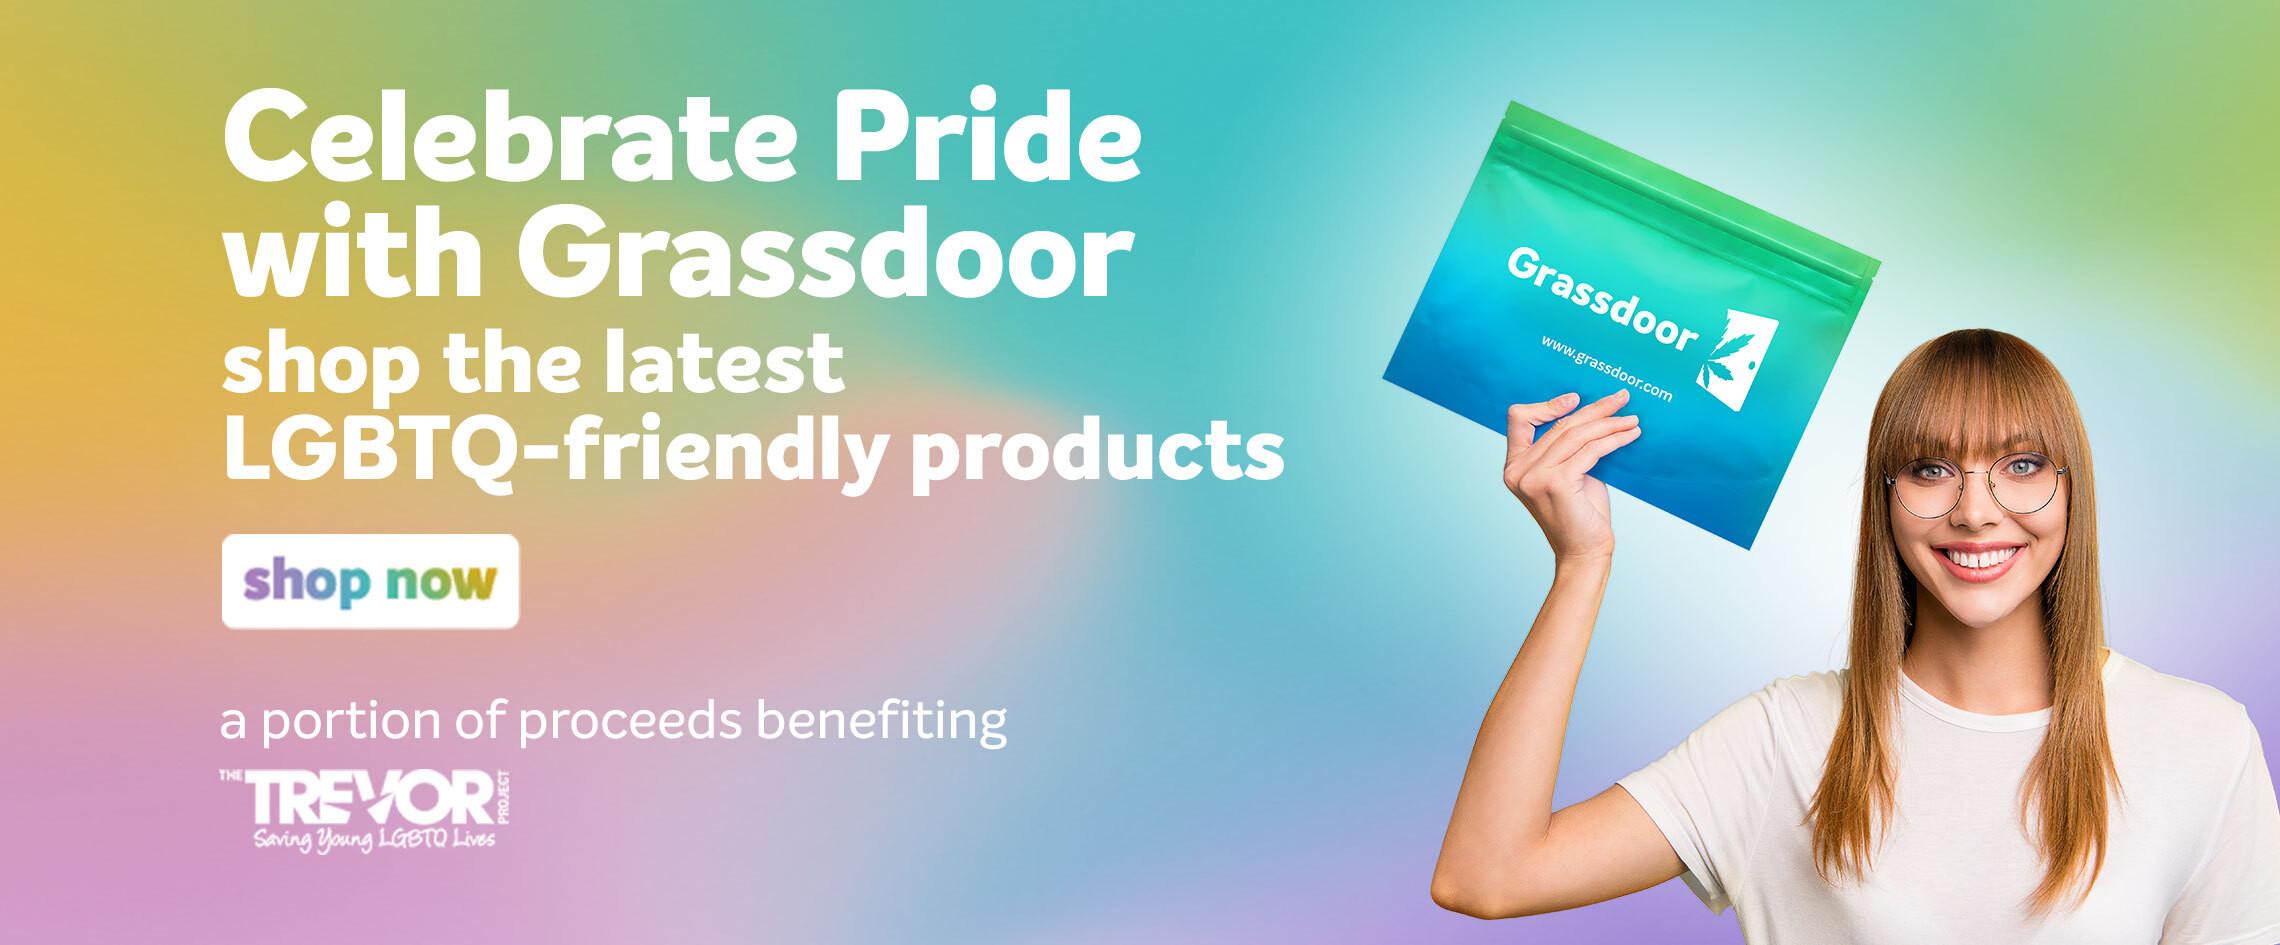 Grassdoor Pride Products and Bundles Delivery